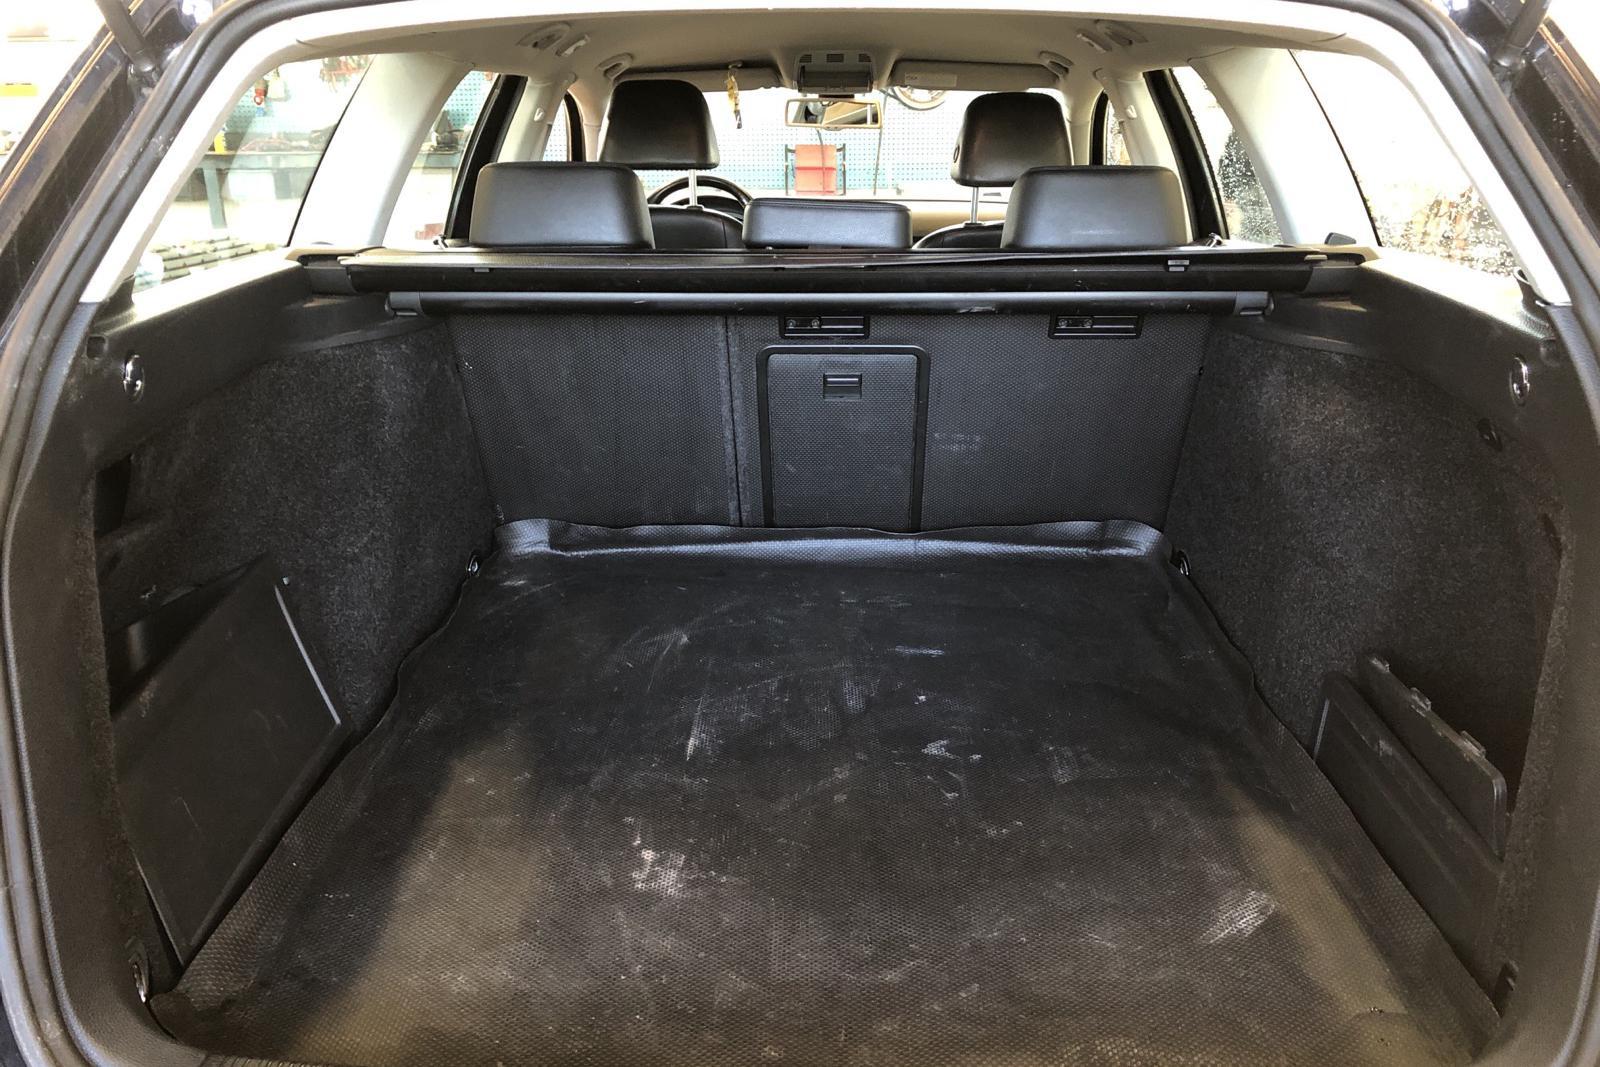 VW Passat 1.4 TSI EcoFuel Variant (150hk) - 22 174 mil - Automat - svart - 2010